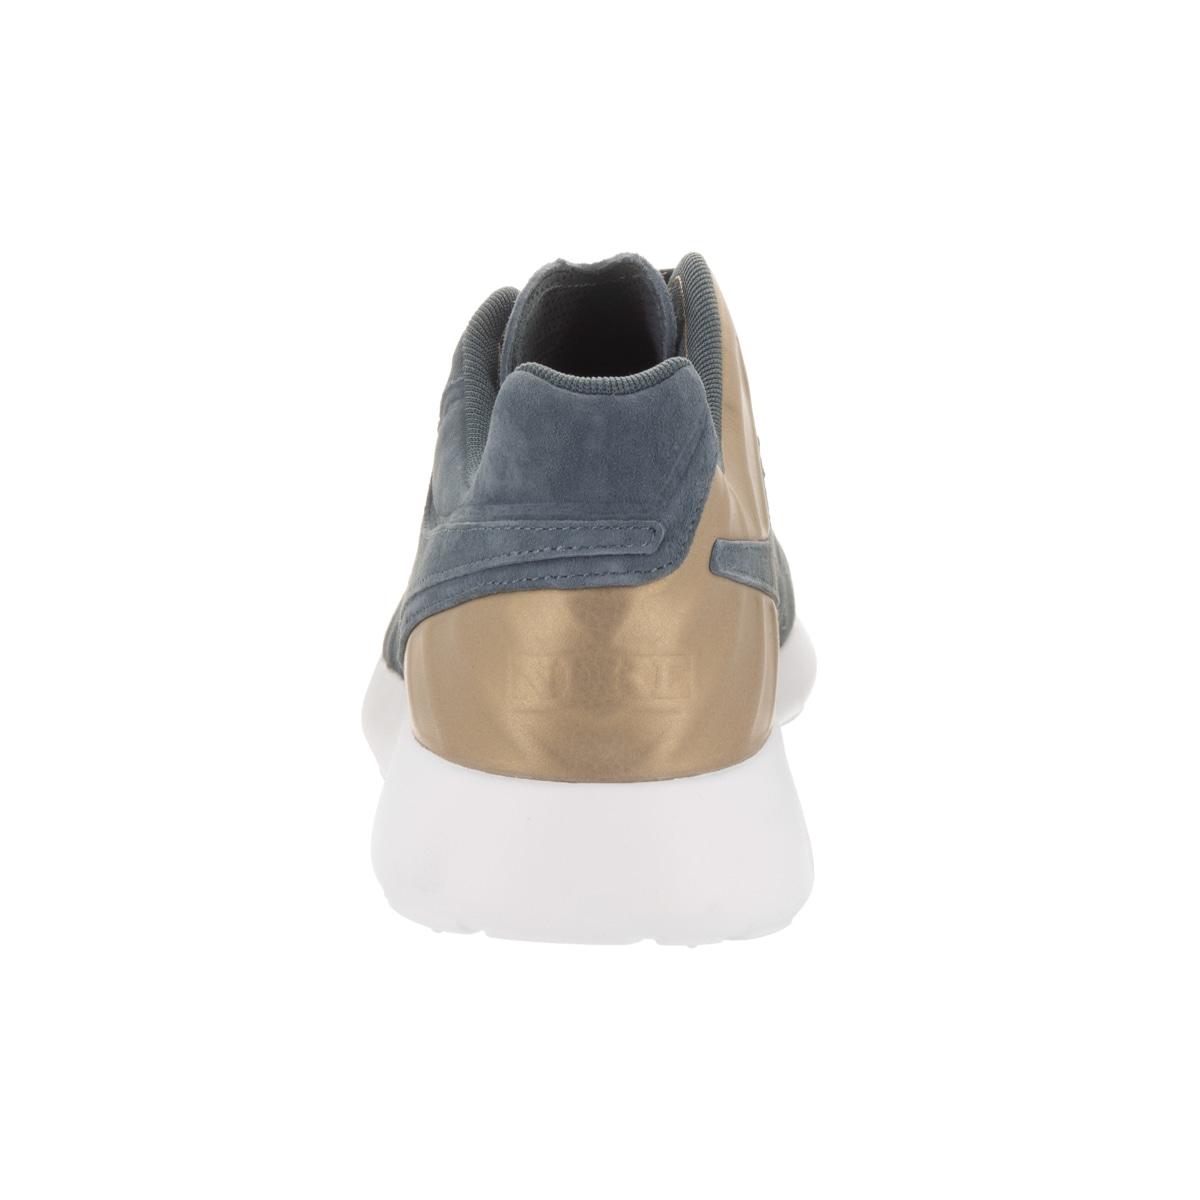 890ca4f08151 Shop Nike Men s Roshe Tiempo VI FC Casual Shoe - Free Shipping Today -  Overstock - 15315571